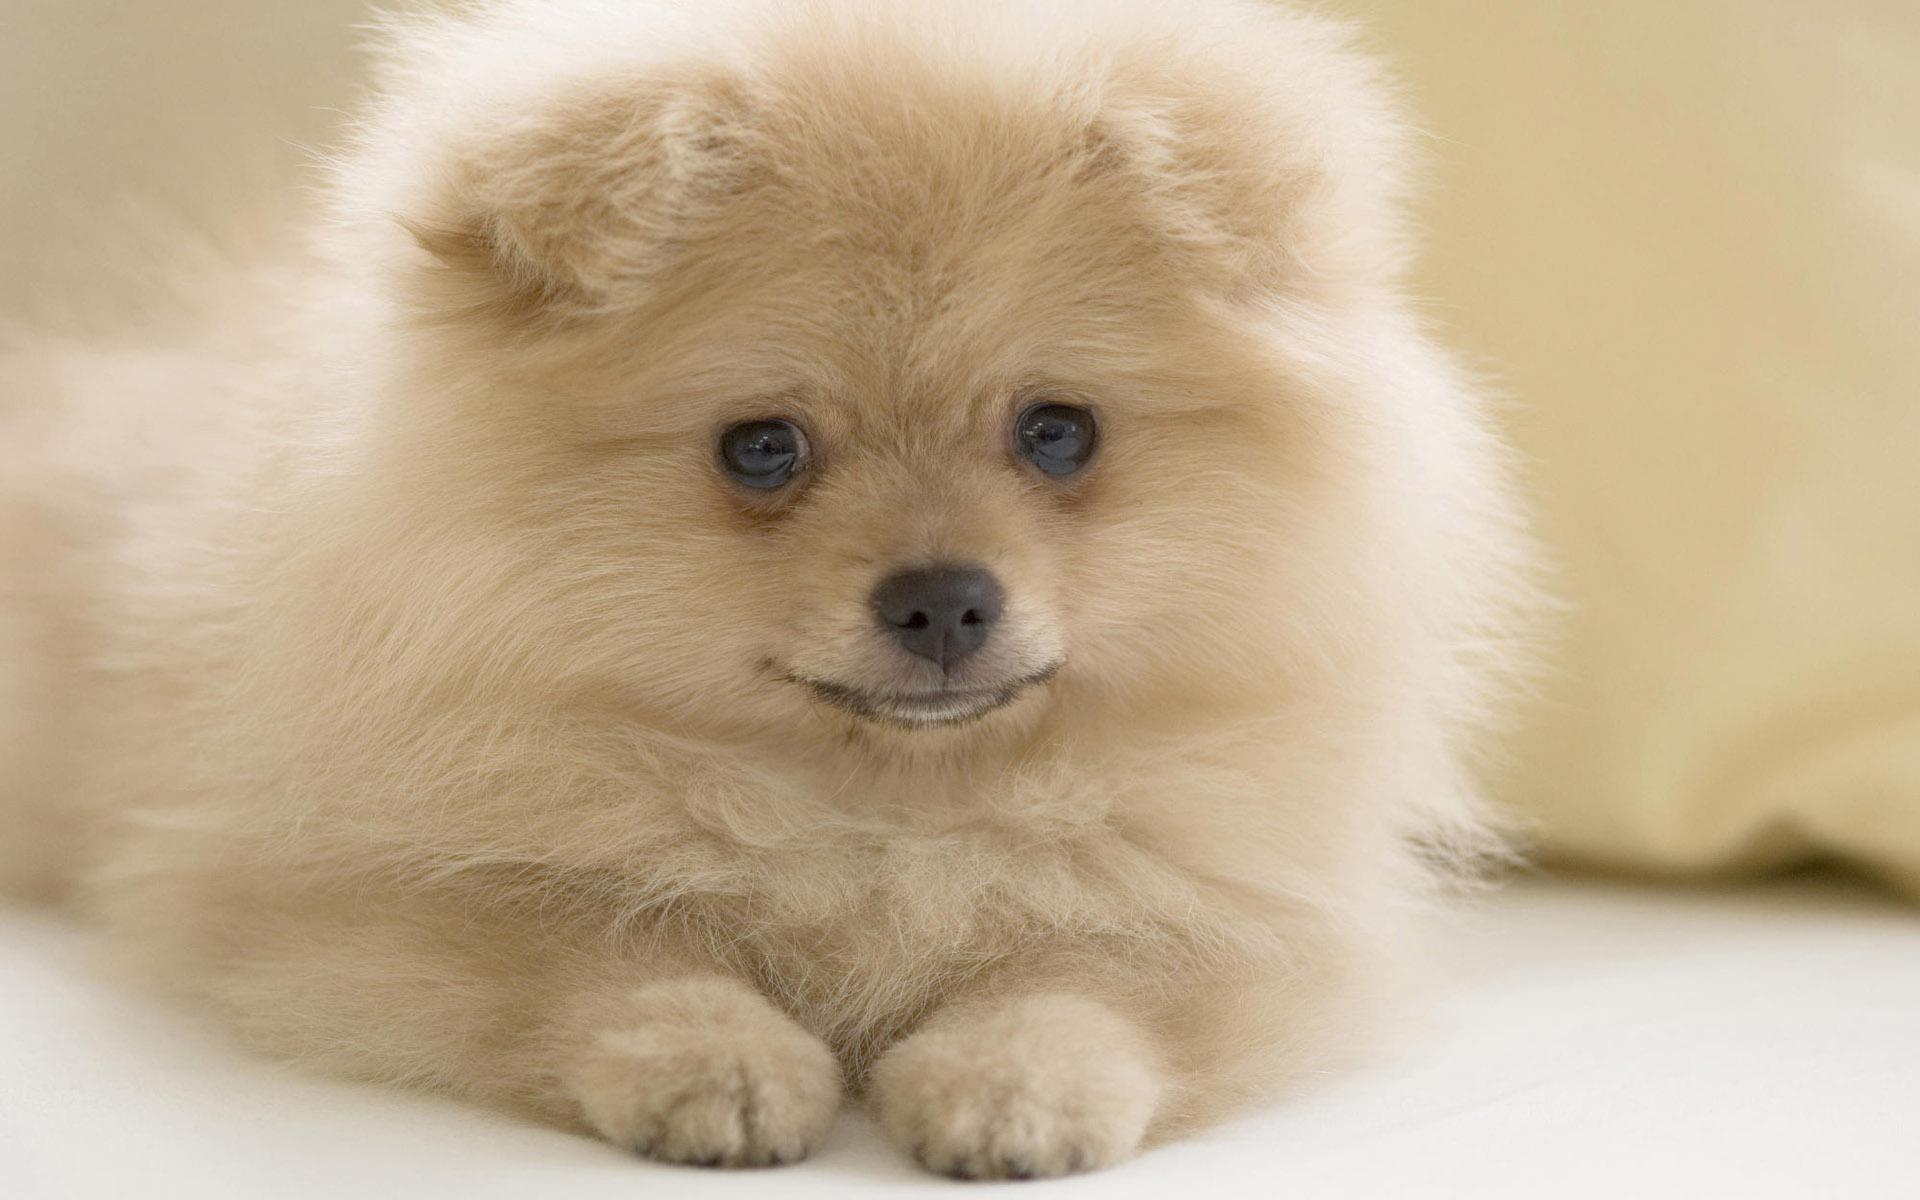 Animal Cute Dog Pomeranian Puppy Wallpaper Resolution 1920x1200 Id 812025 Wallha Com